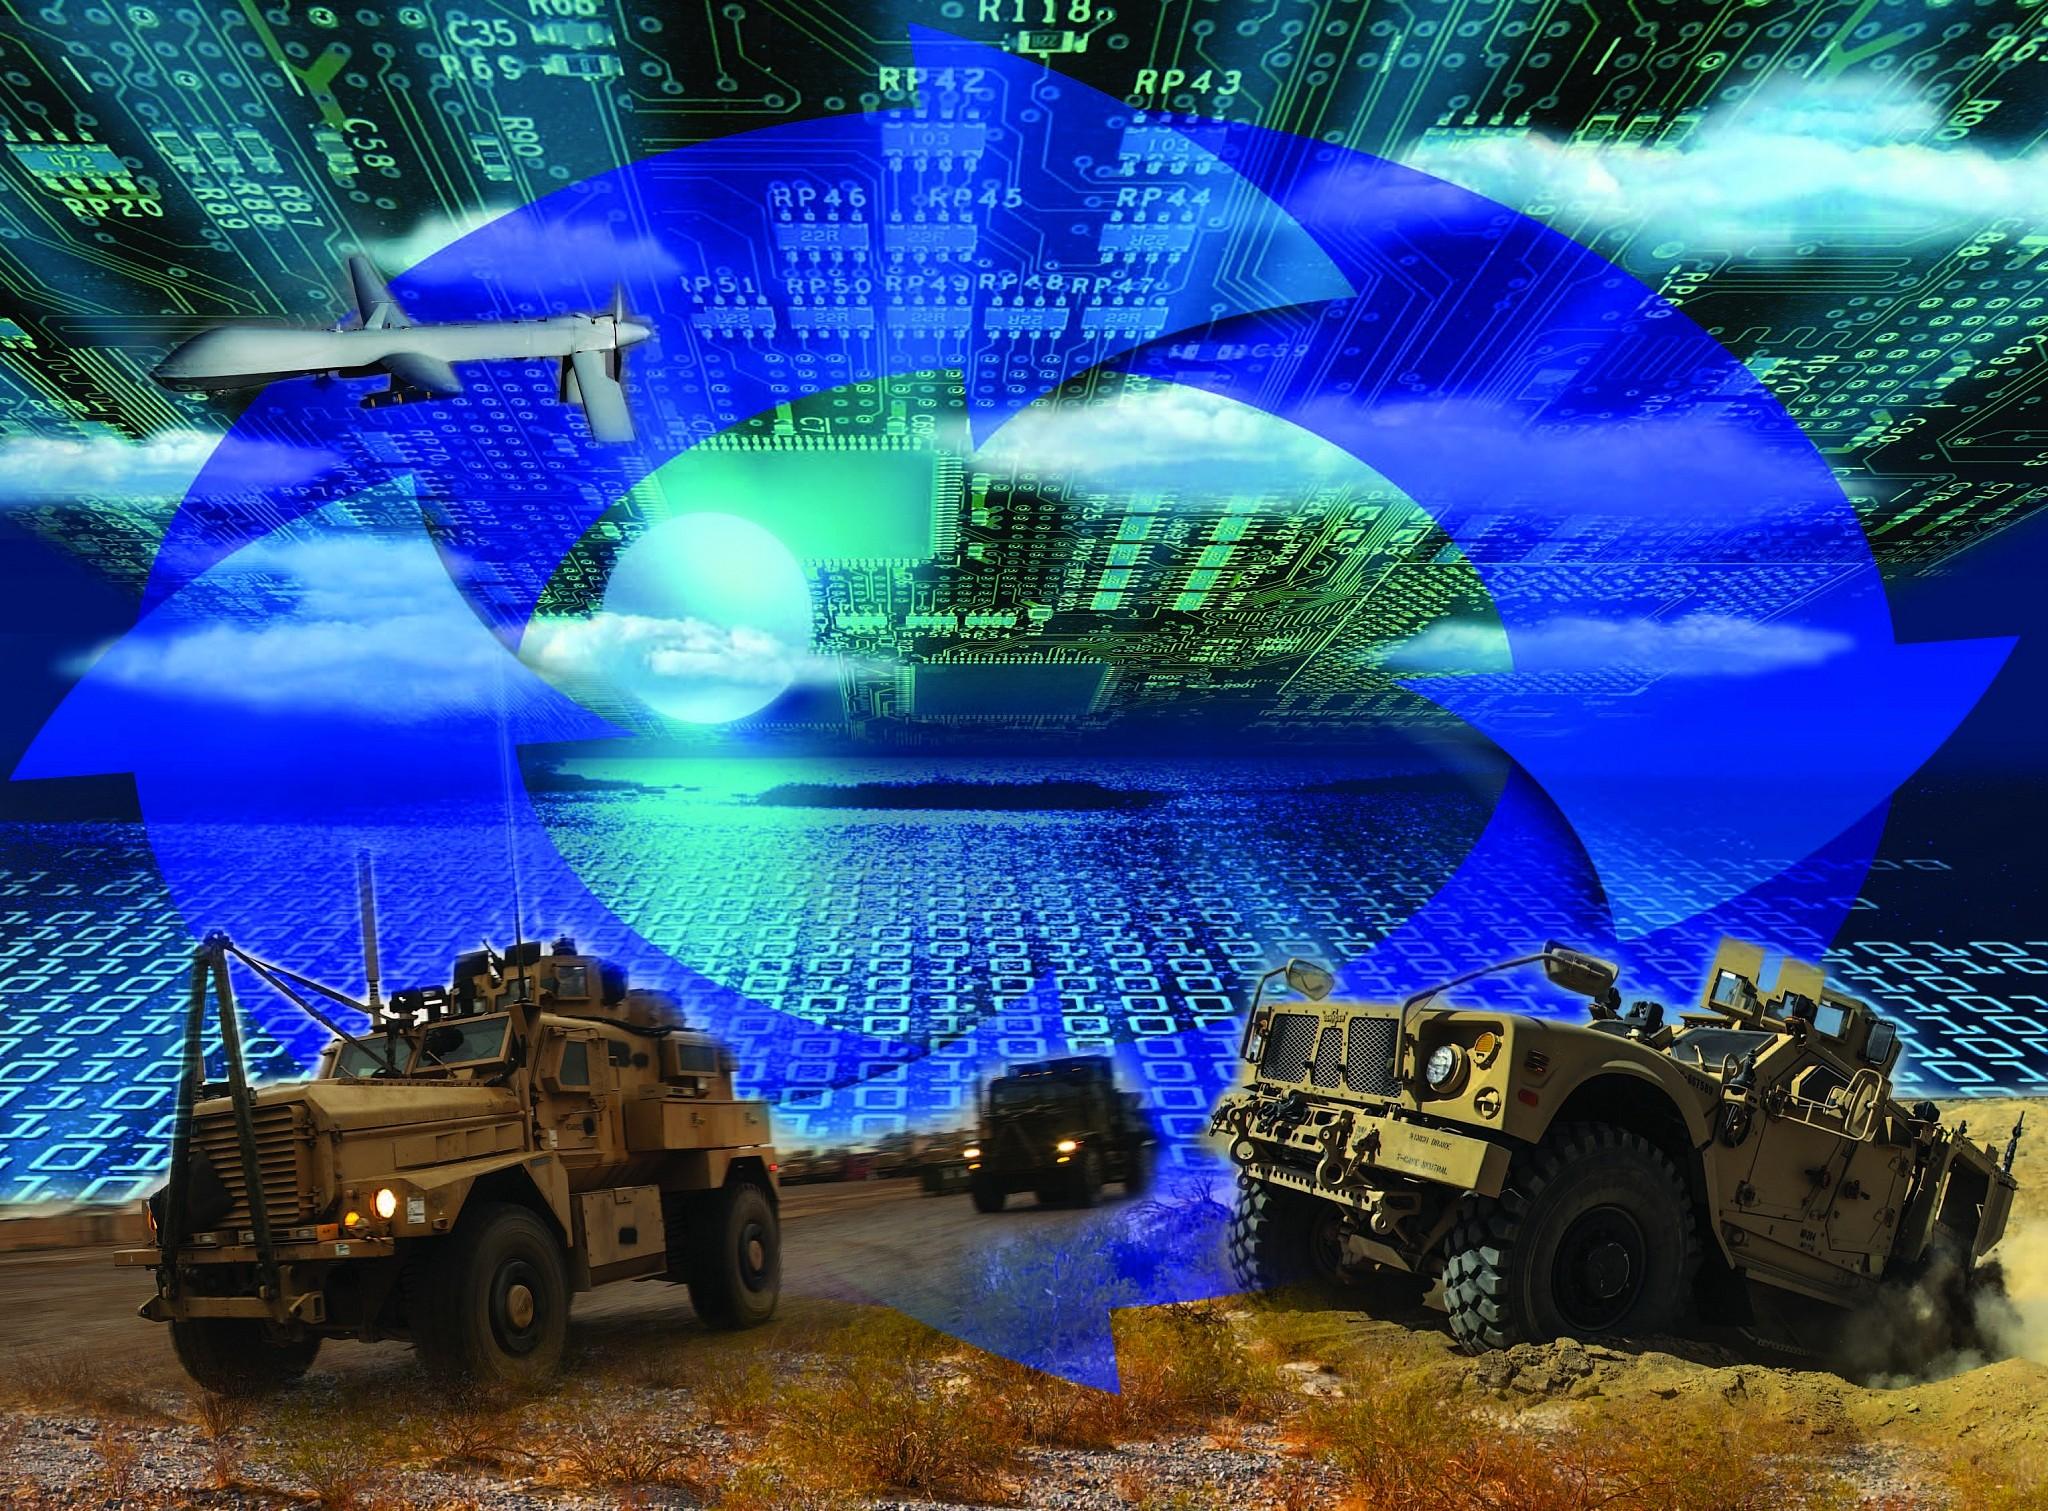 Is a Middle East Cyberwar Looming?